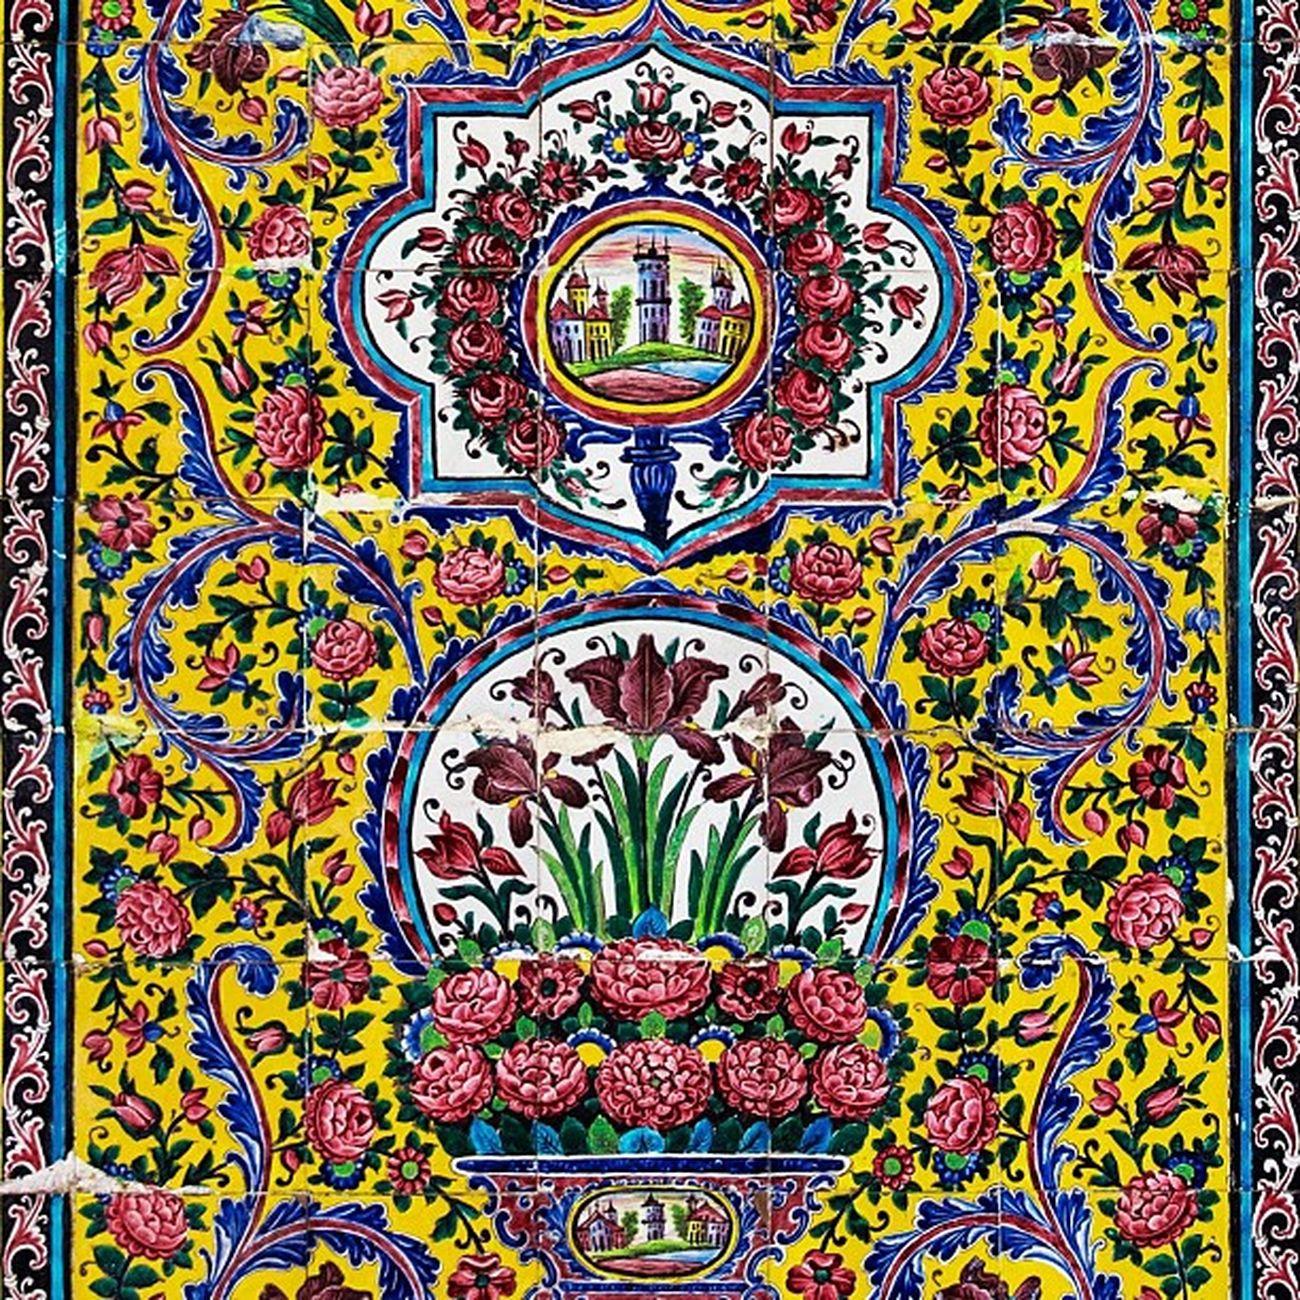 کاشی کاری مسجد نصیرالملک - Nasir al-Mulk Mosque interior design